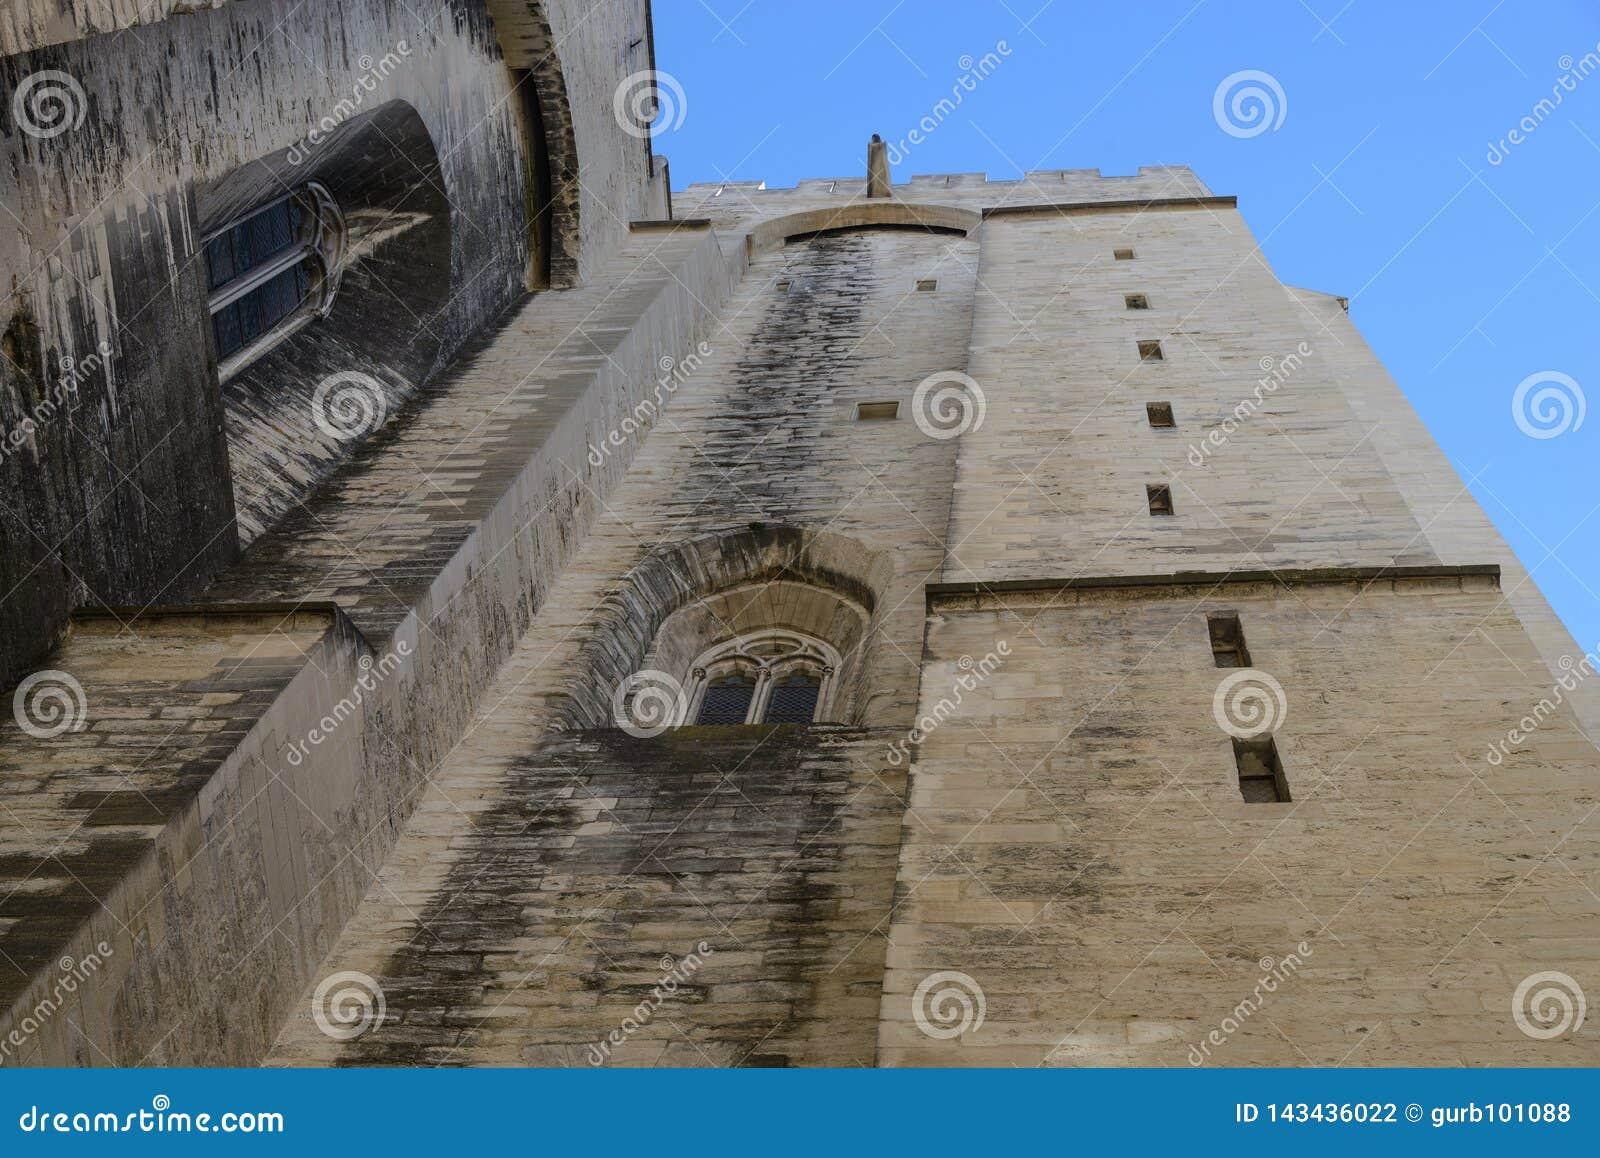 Avignon: Paleis van de Pausen